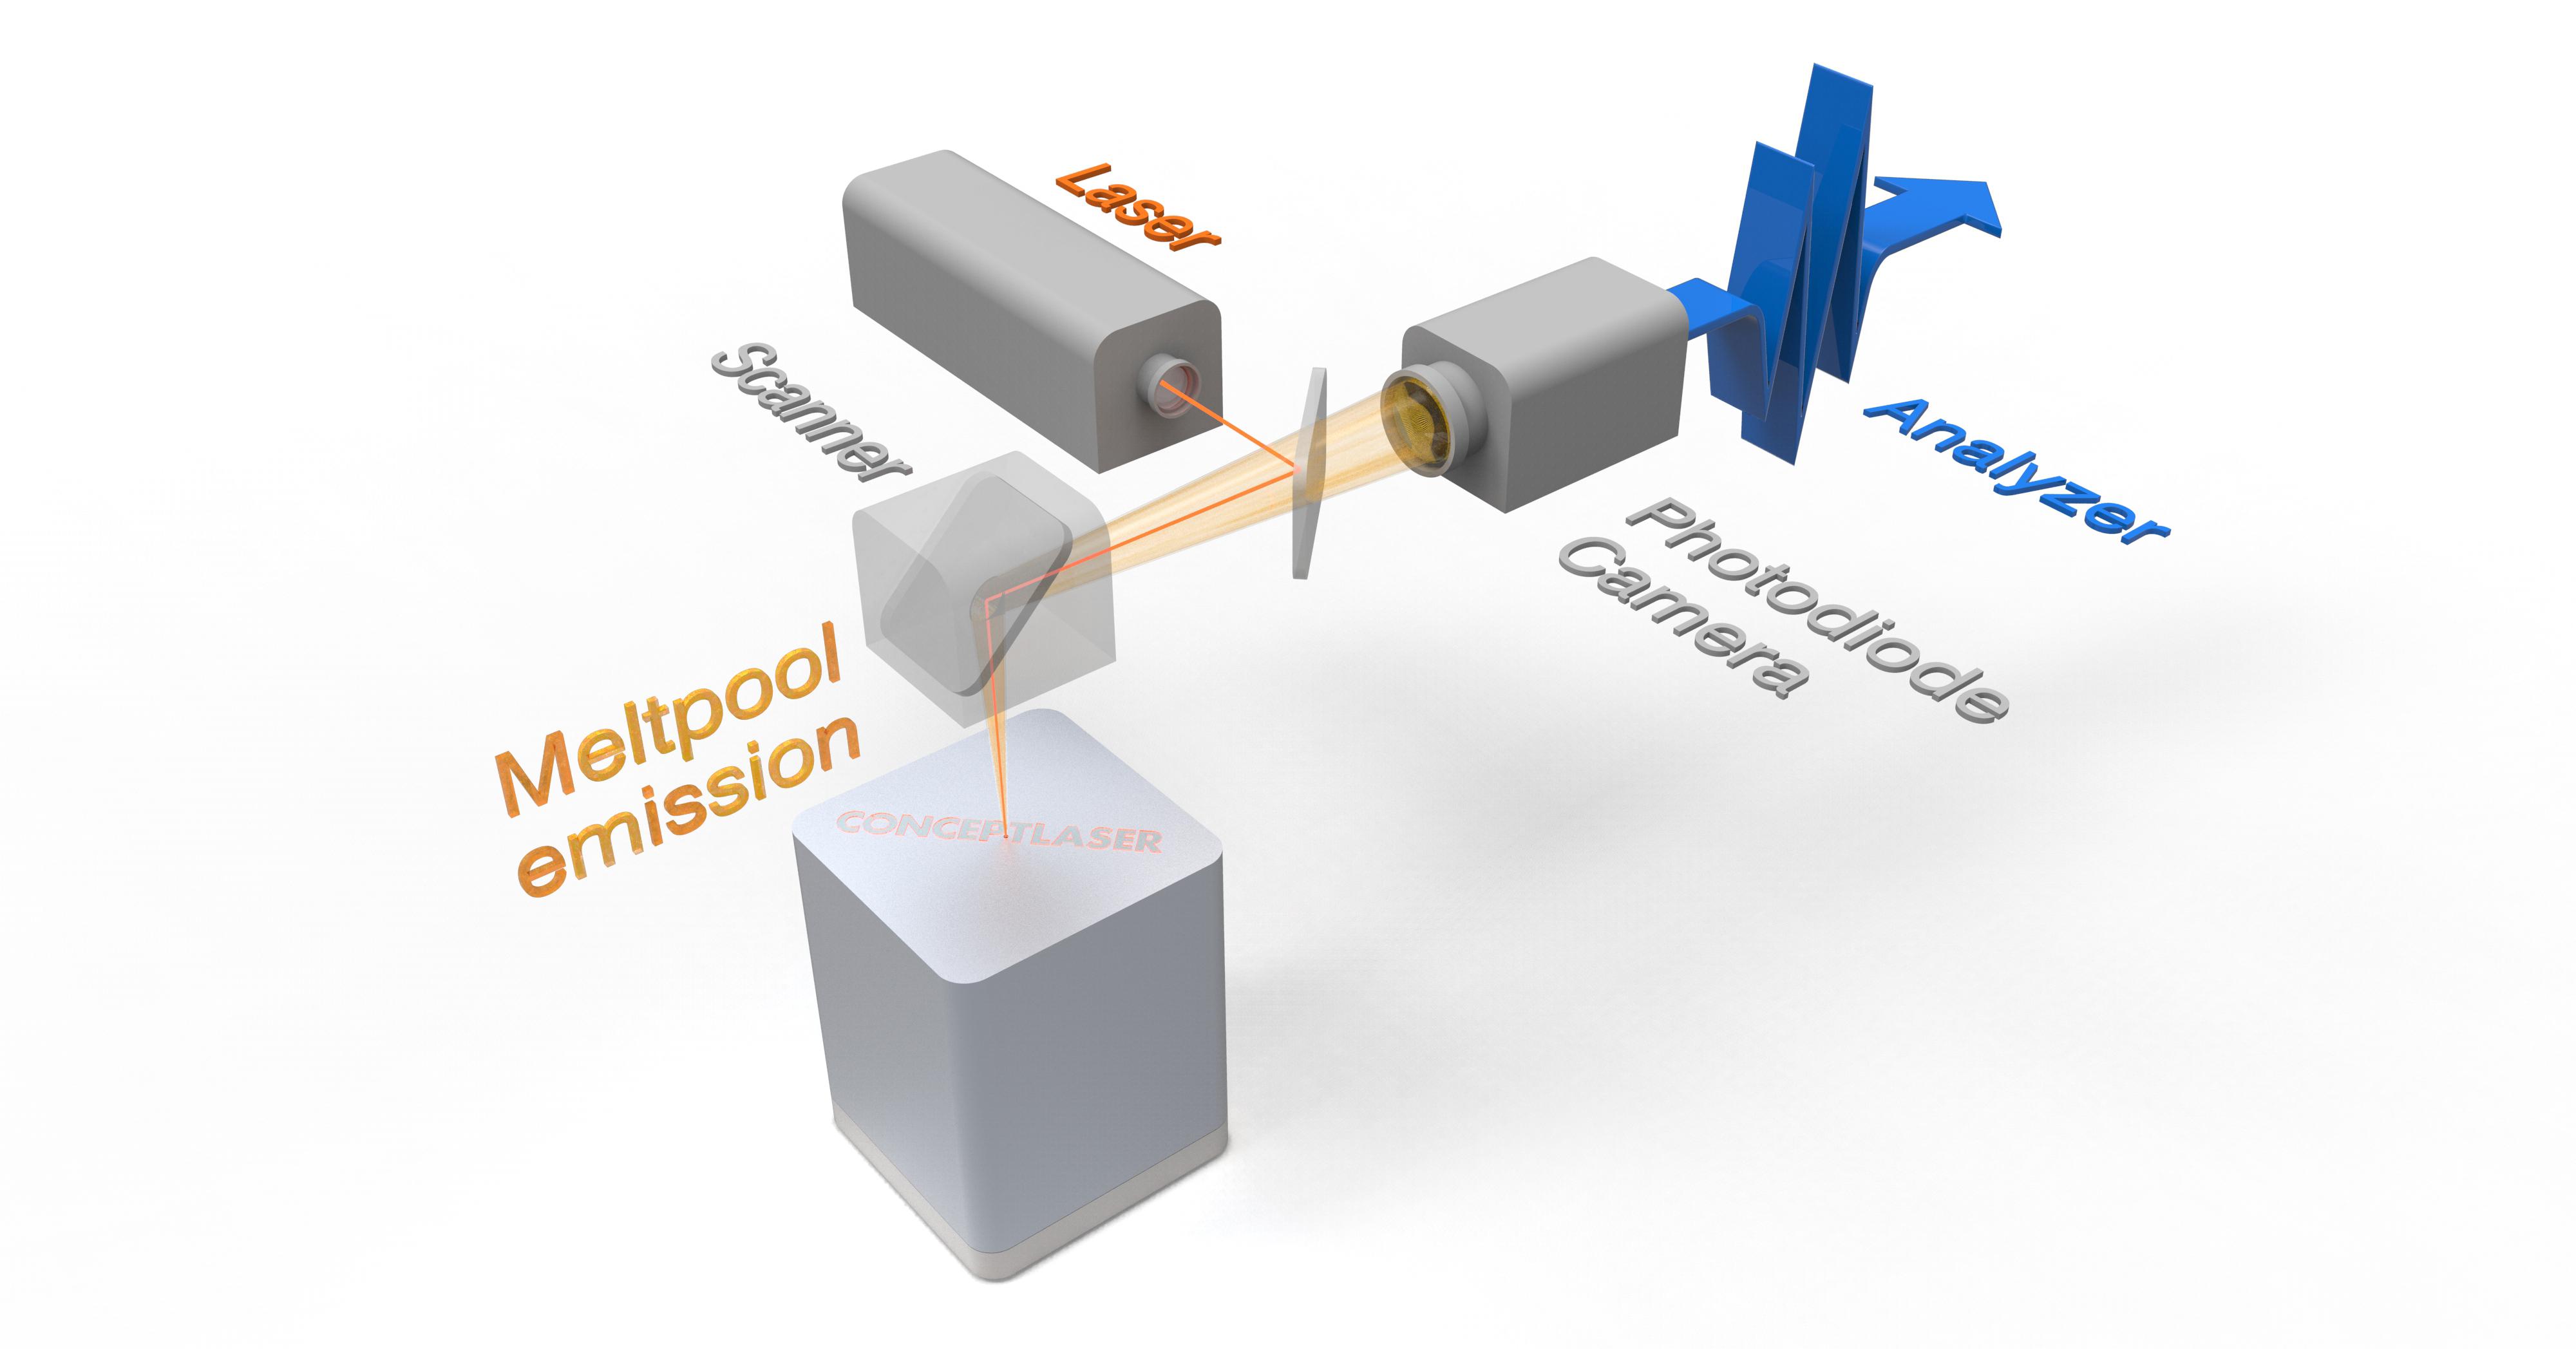 concept_laser_3d_printer_3d_druck_1